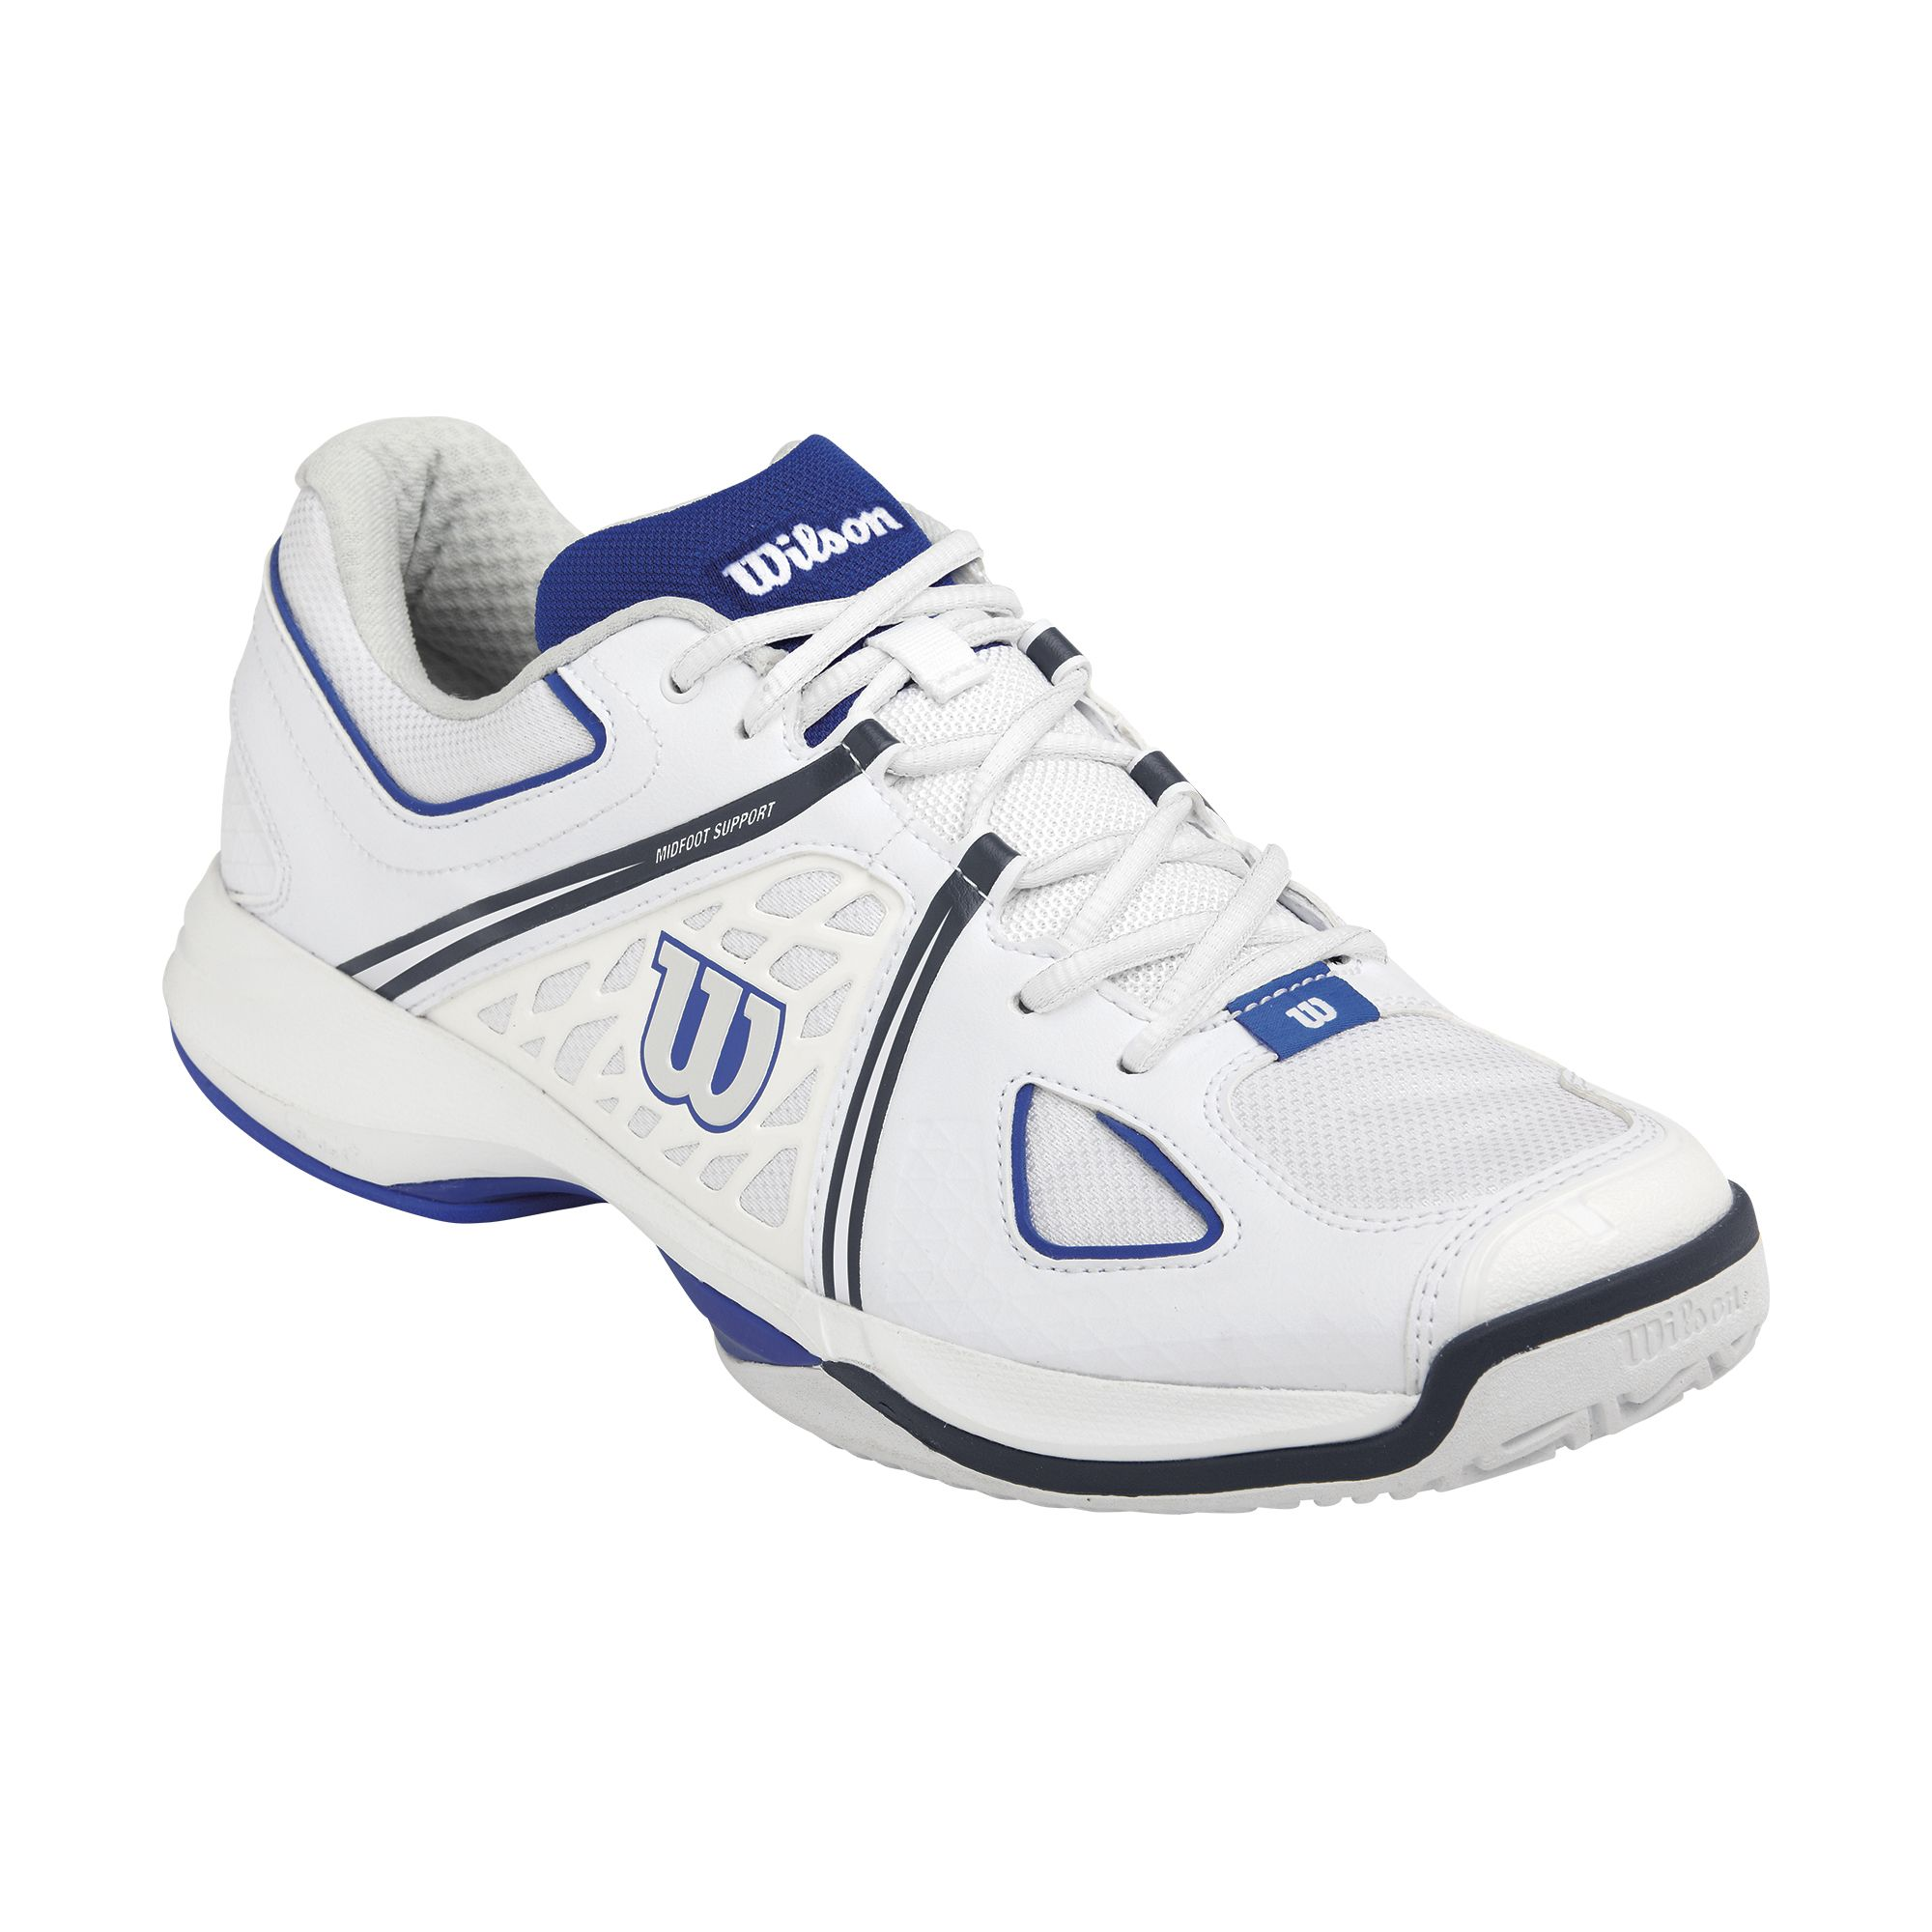 Wilson nVision Mens Tennis Shoes SS15 - Sweatband.com